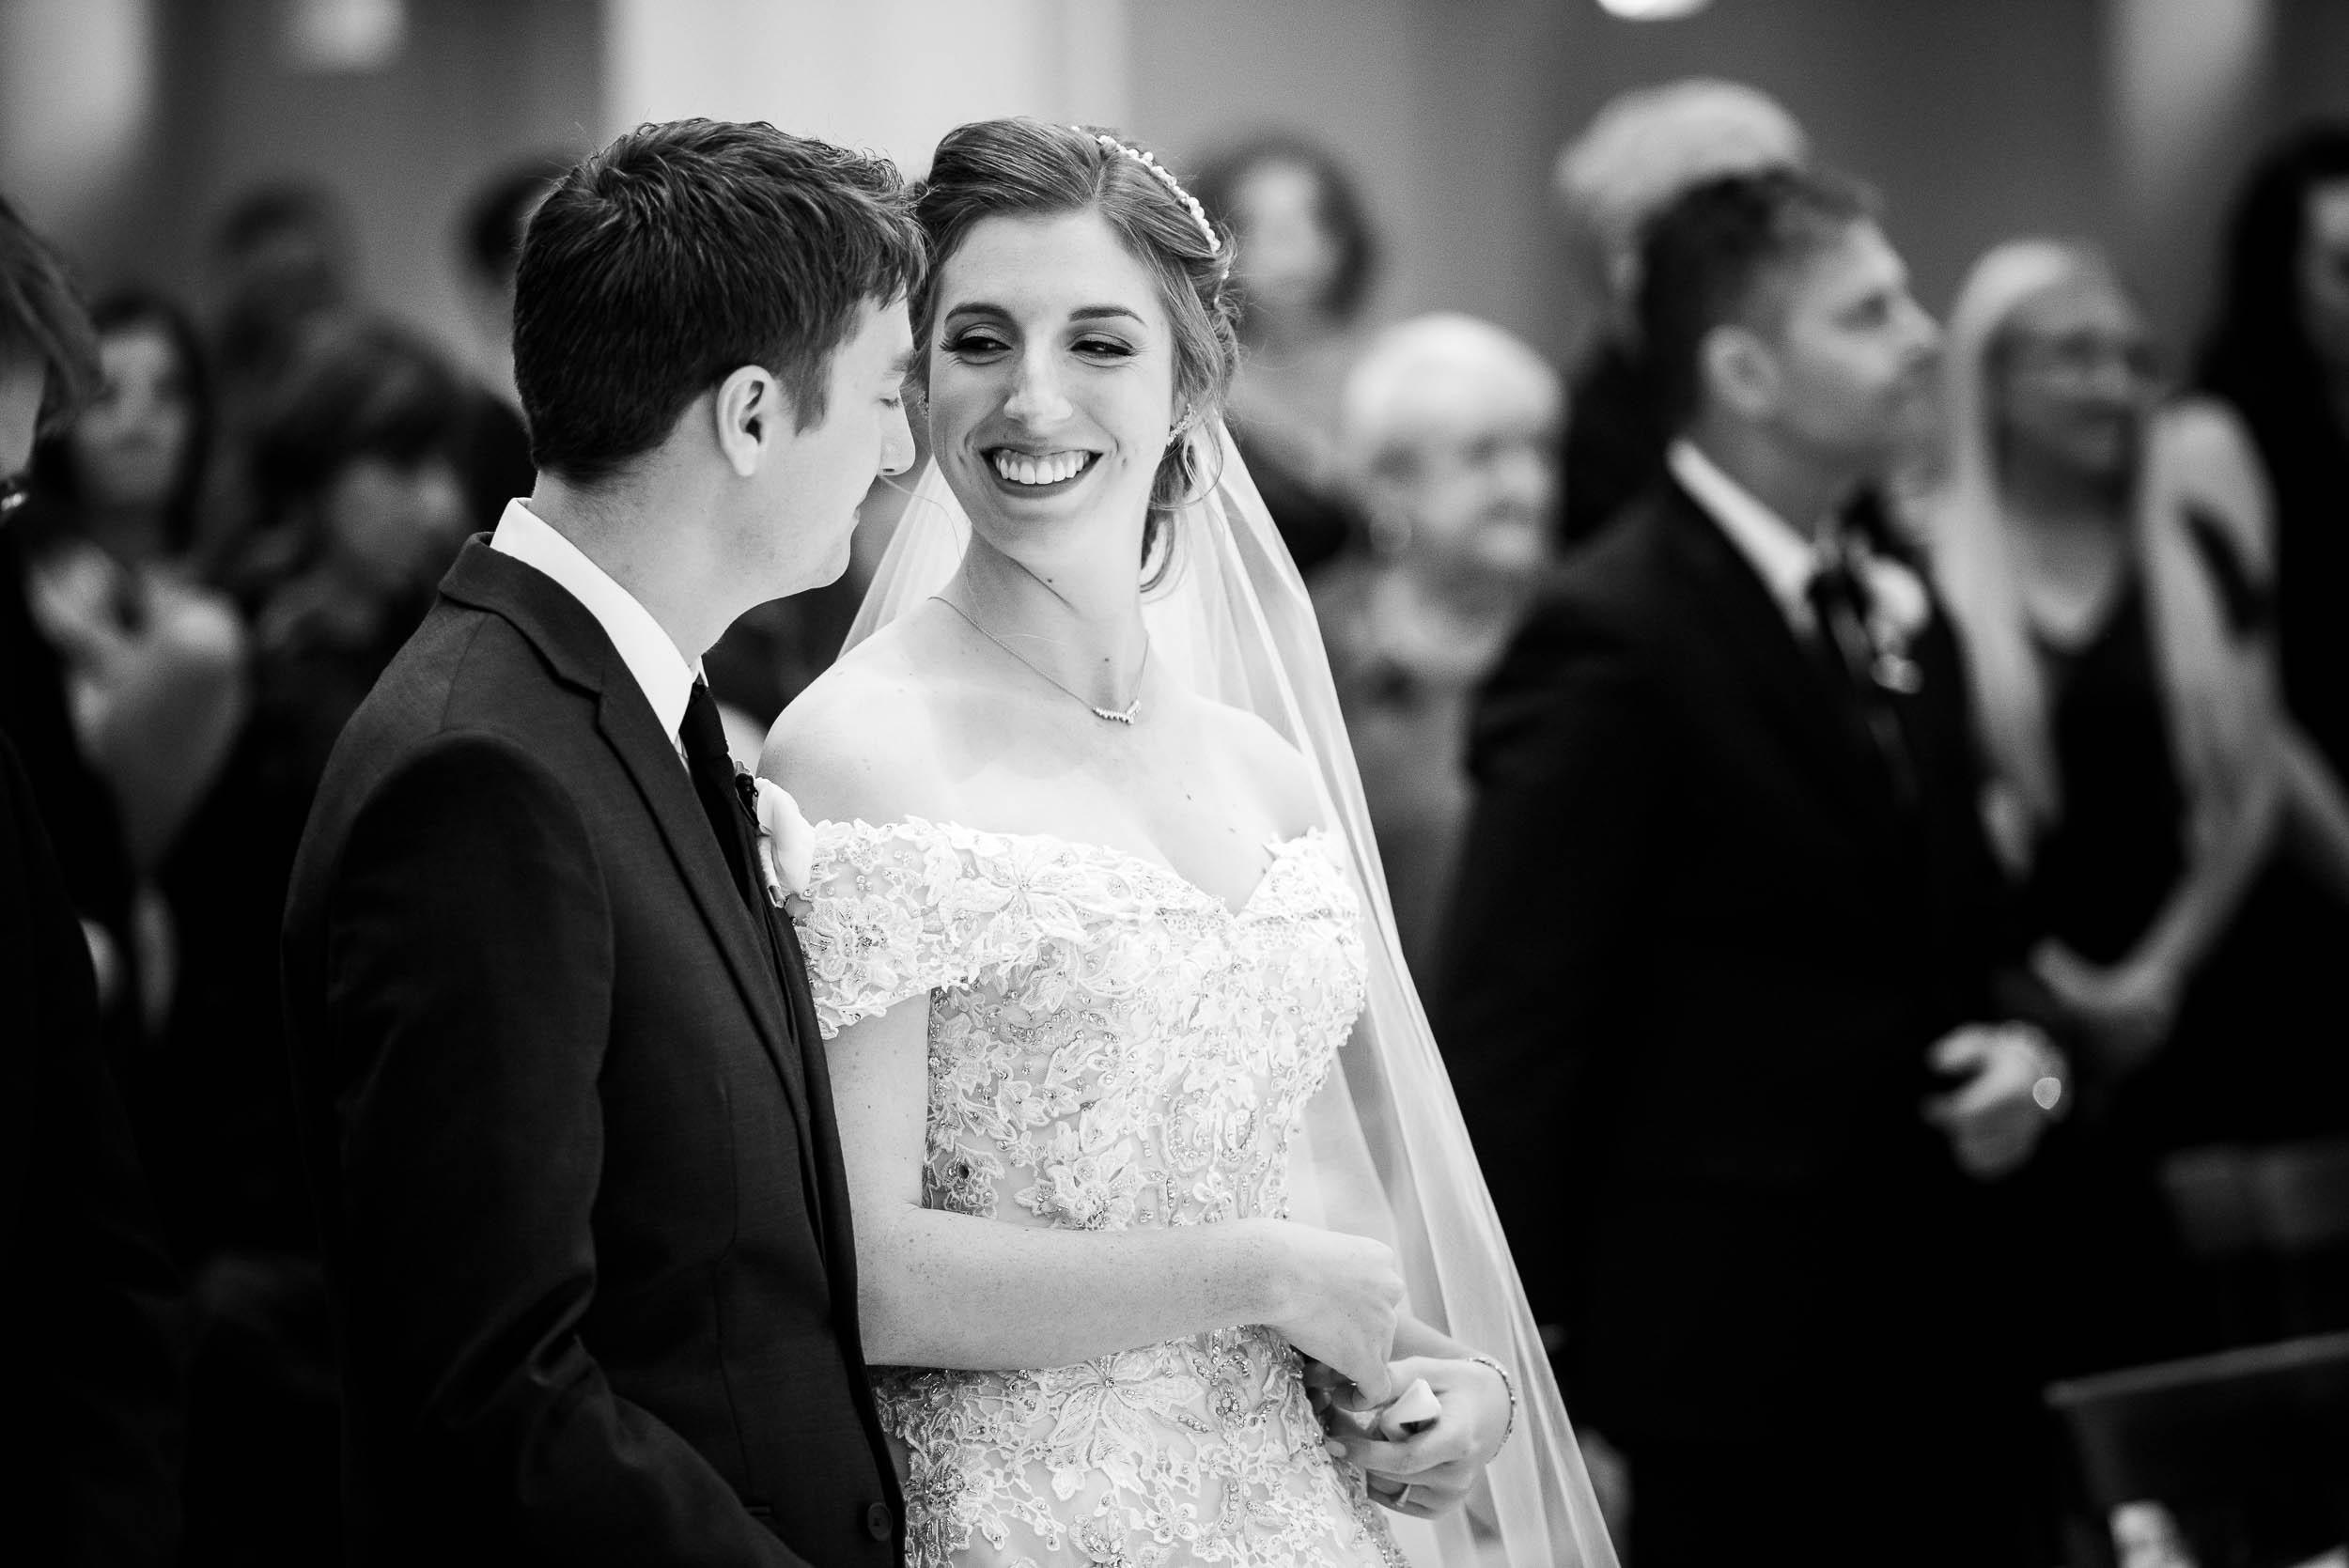 Brides gazes toward her groom during a wedding ceremony at Madonna Della Strada.